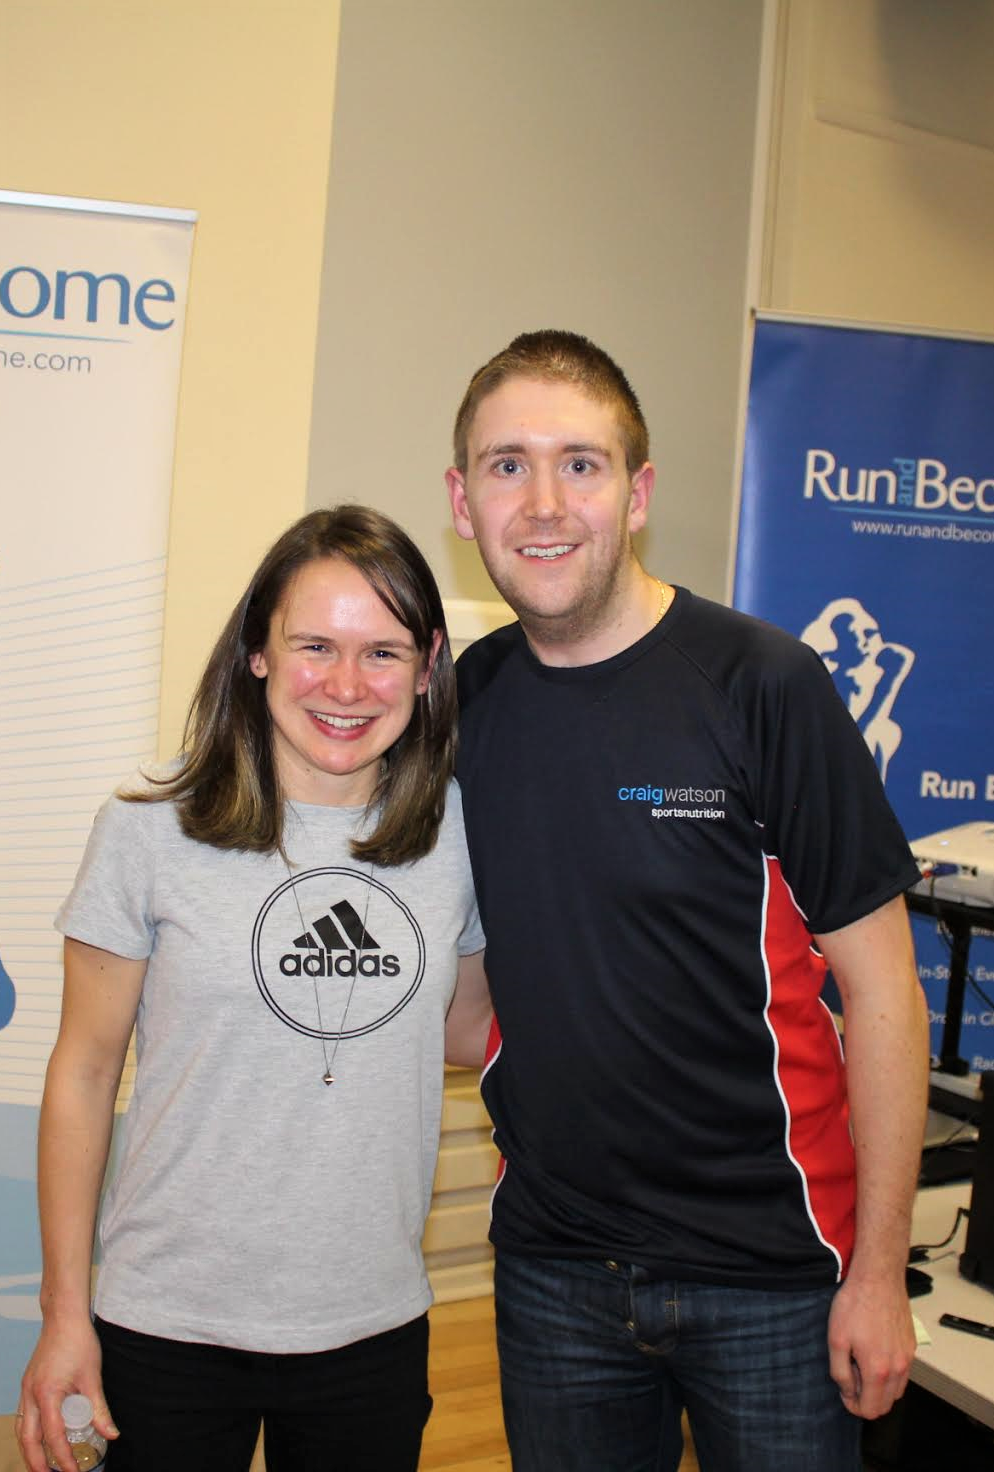 Craig with Olympic marathon runner Freya ross